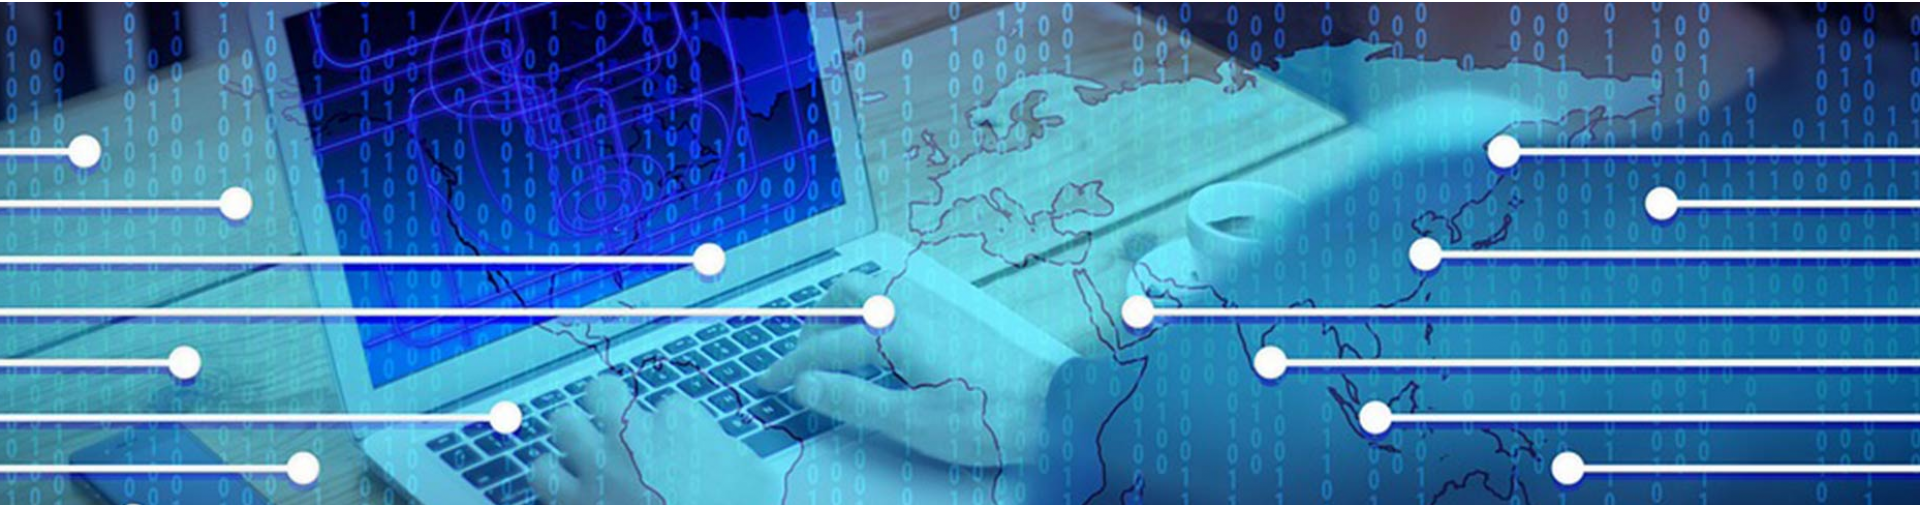 services-programmation-web-2.png